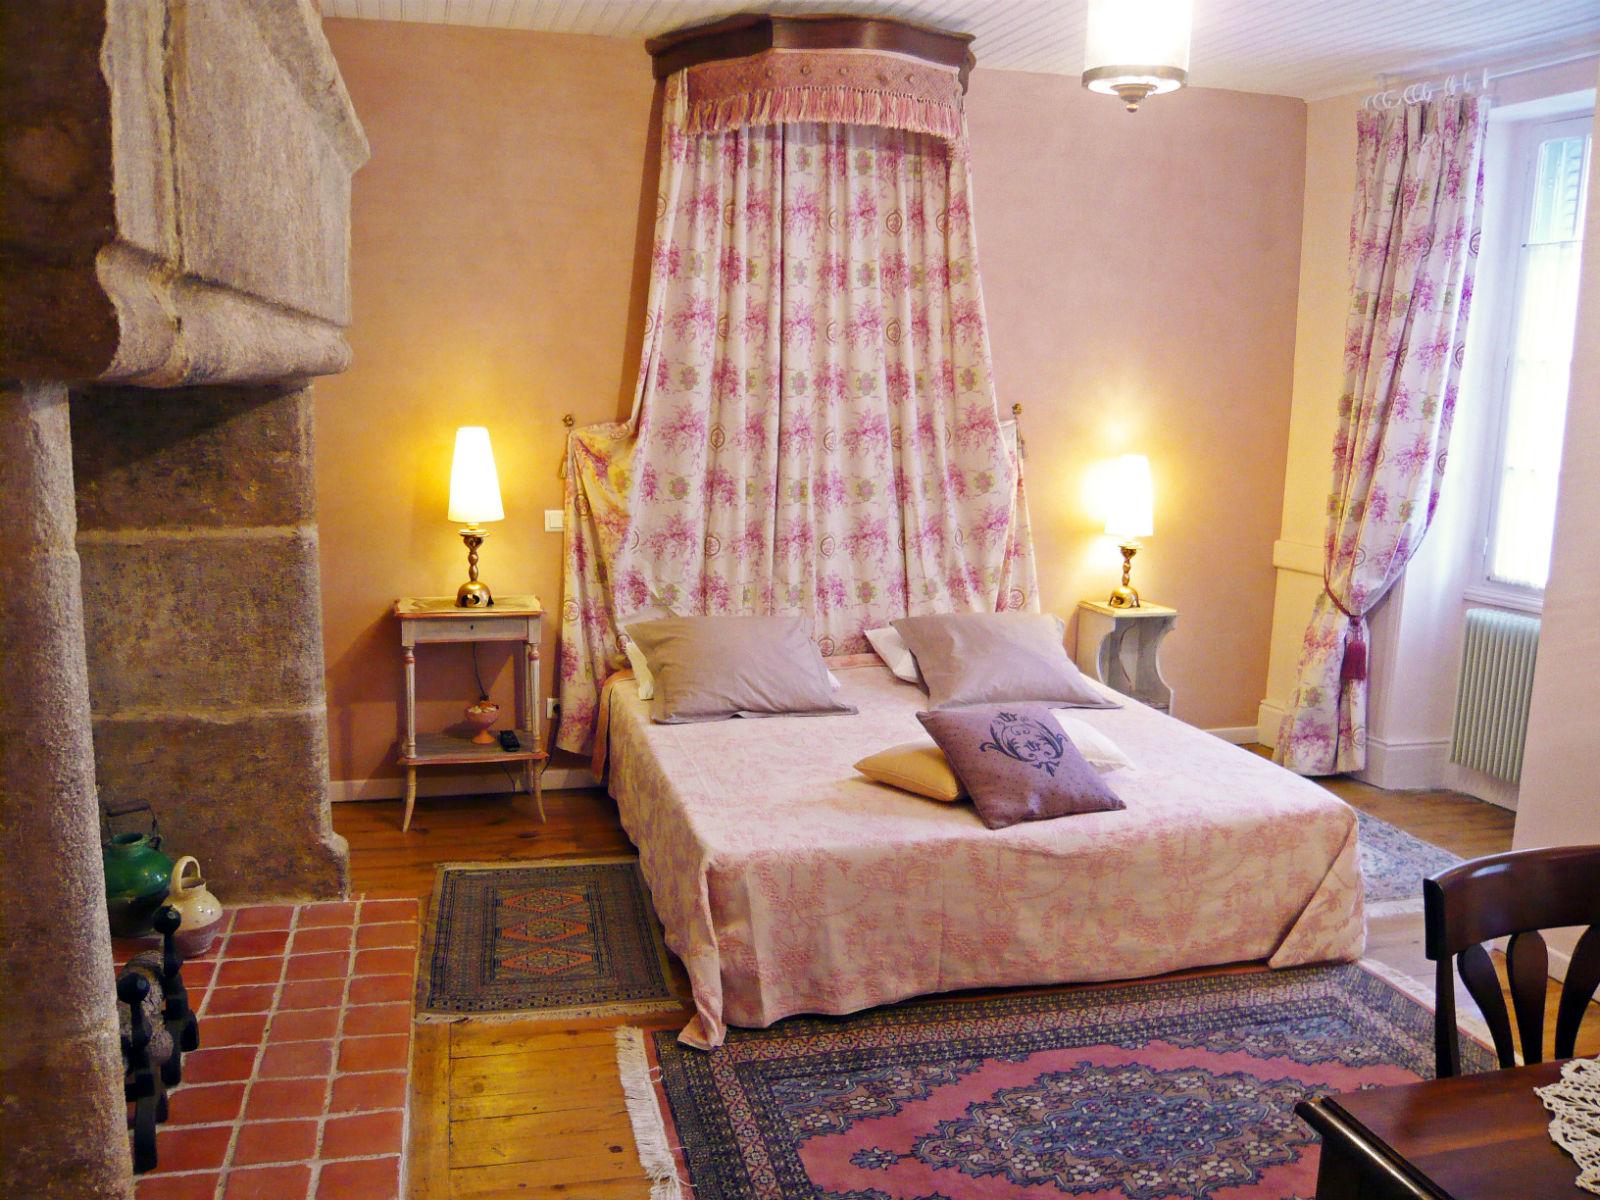 Chambre d hote lilas rose figeac 215017 la for Chambre d hote dans le lot